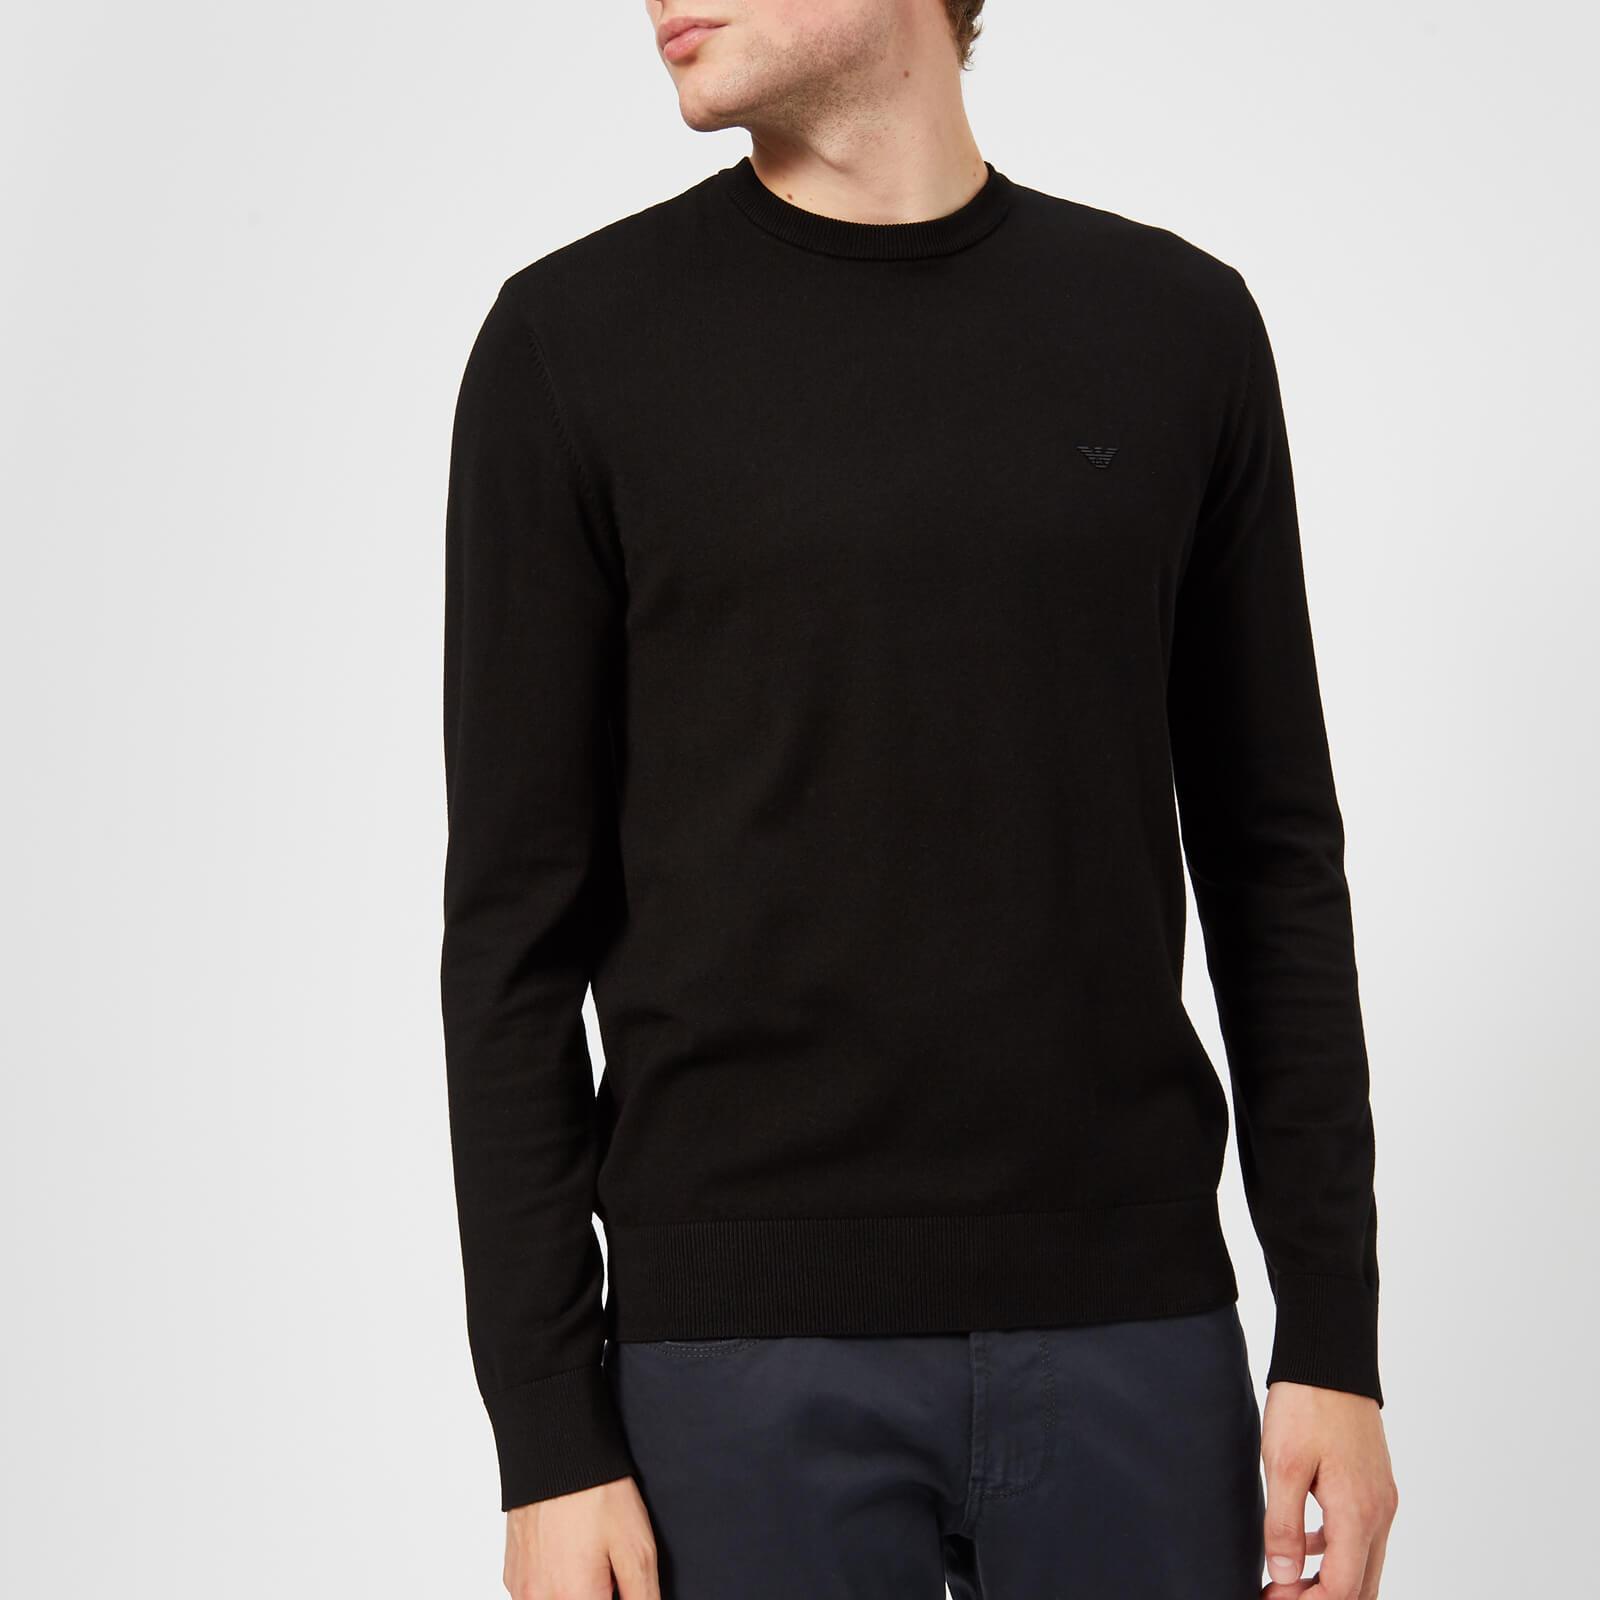 Emporio Armani Men's Basic Crew Neck Sweater - Black - S - Black